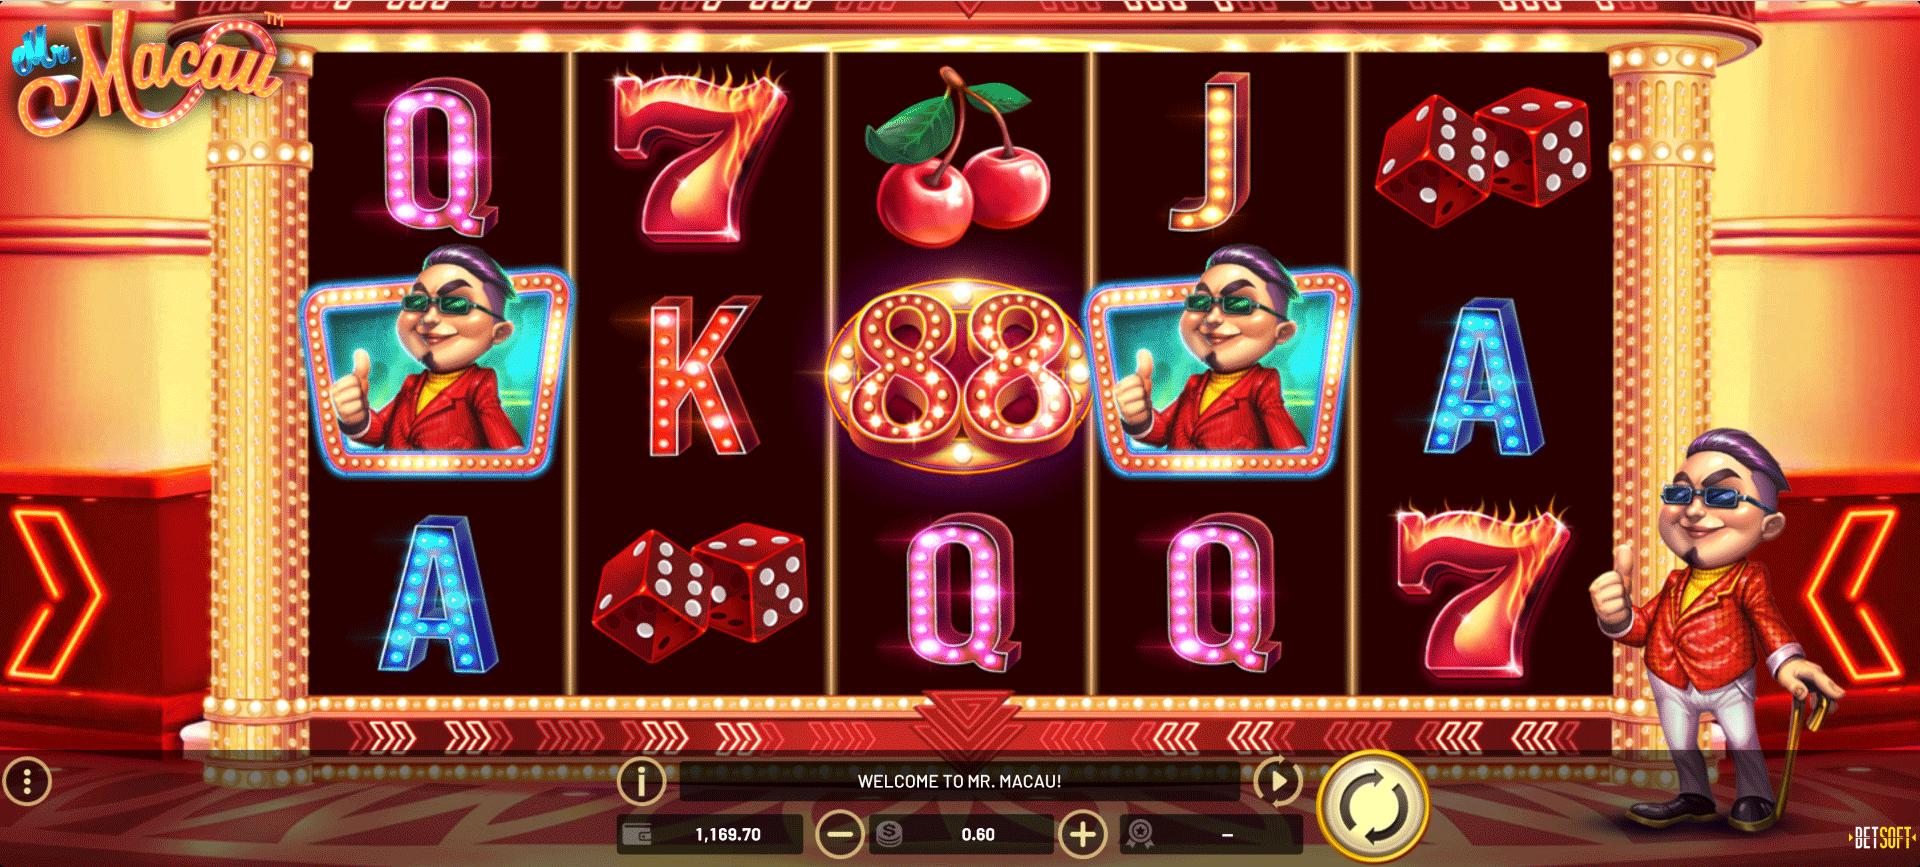 Slot Mr Macau